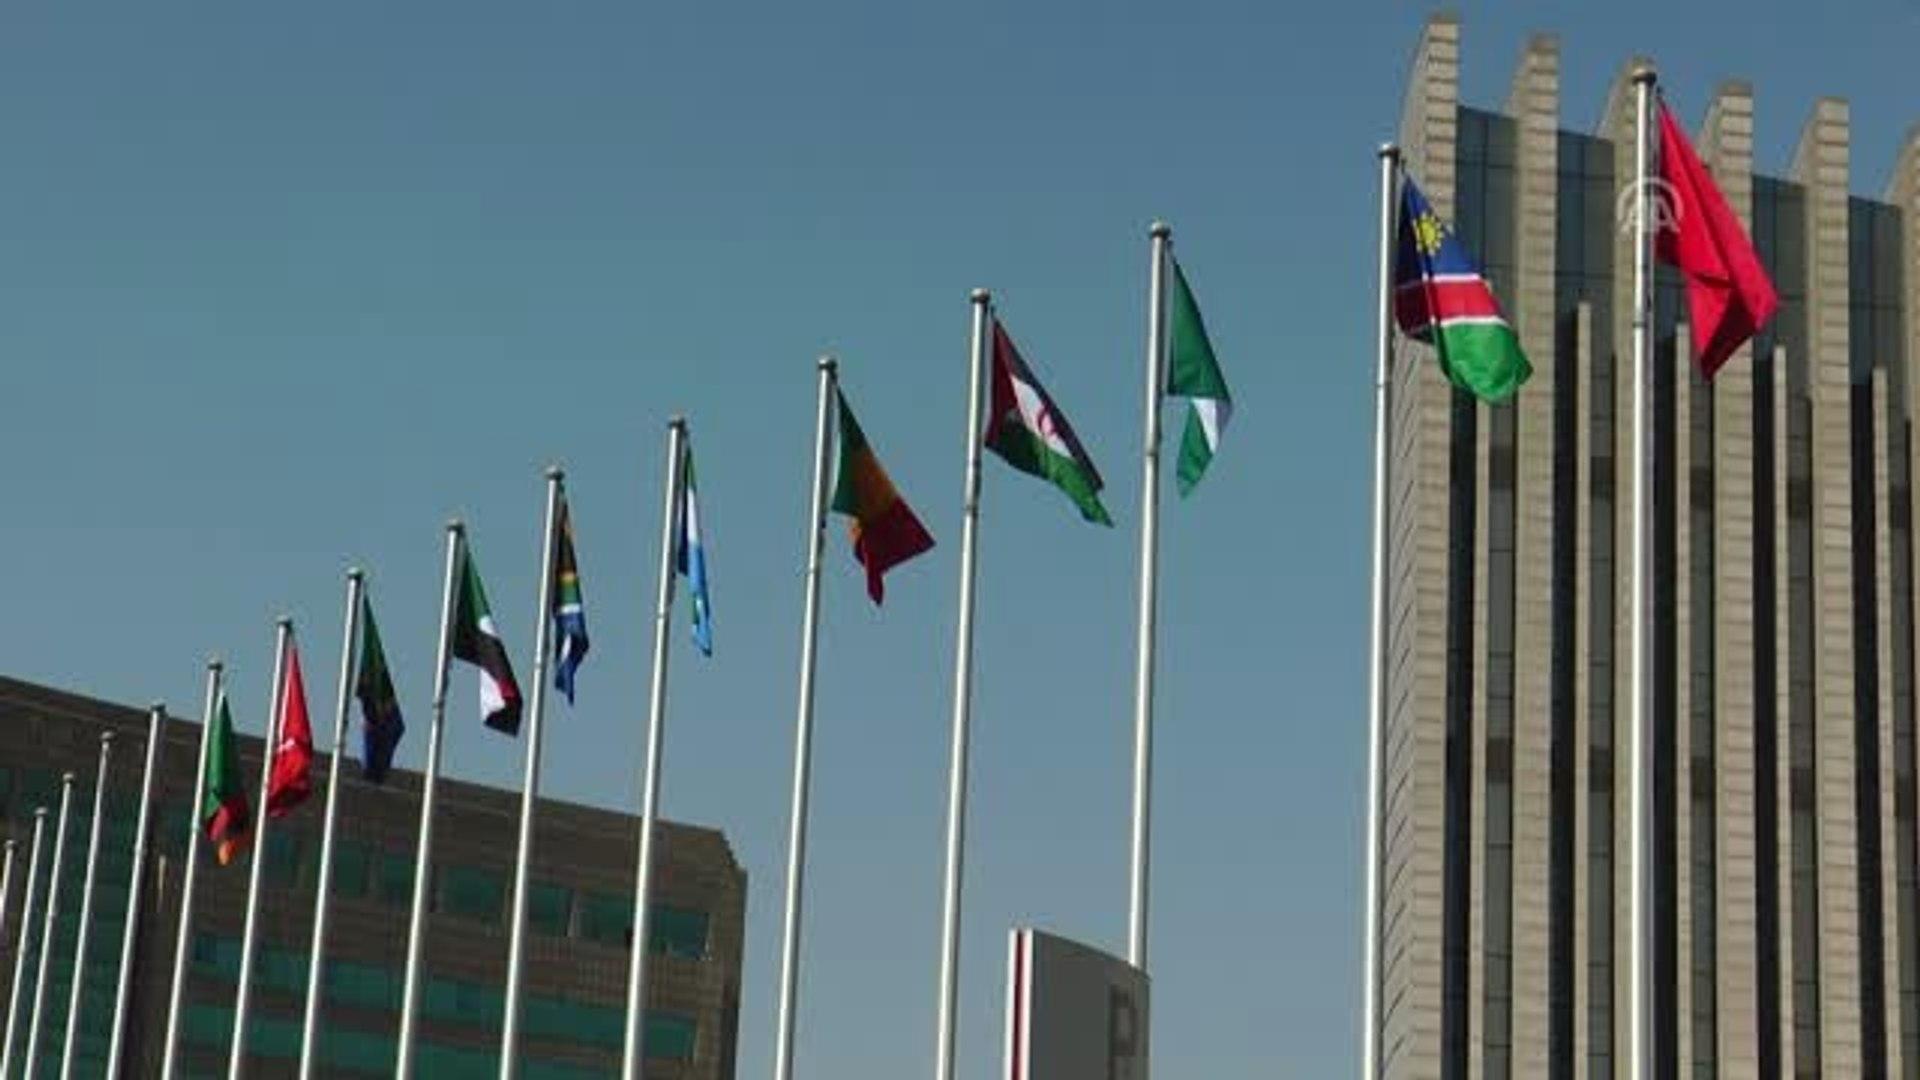 BM Genel Sekreteri Antonio Guterres, Etiyopya'da - Addis Ababa